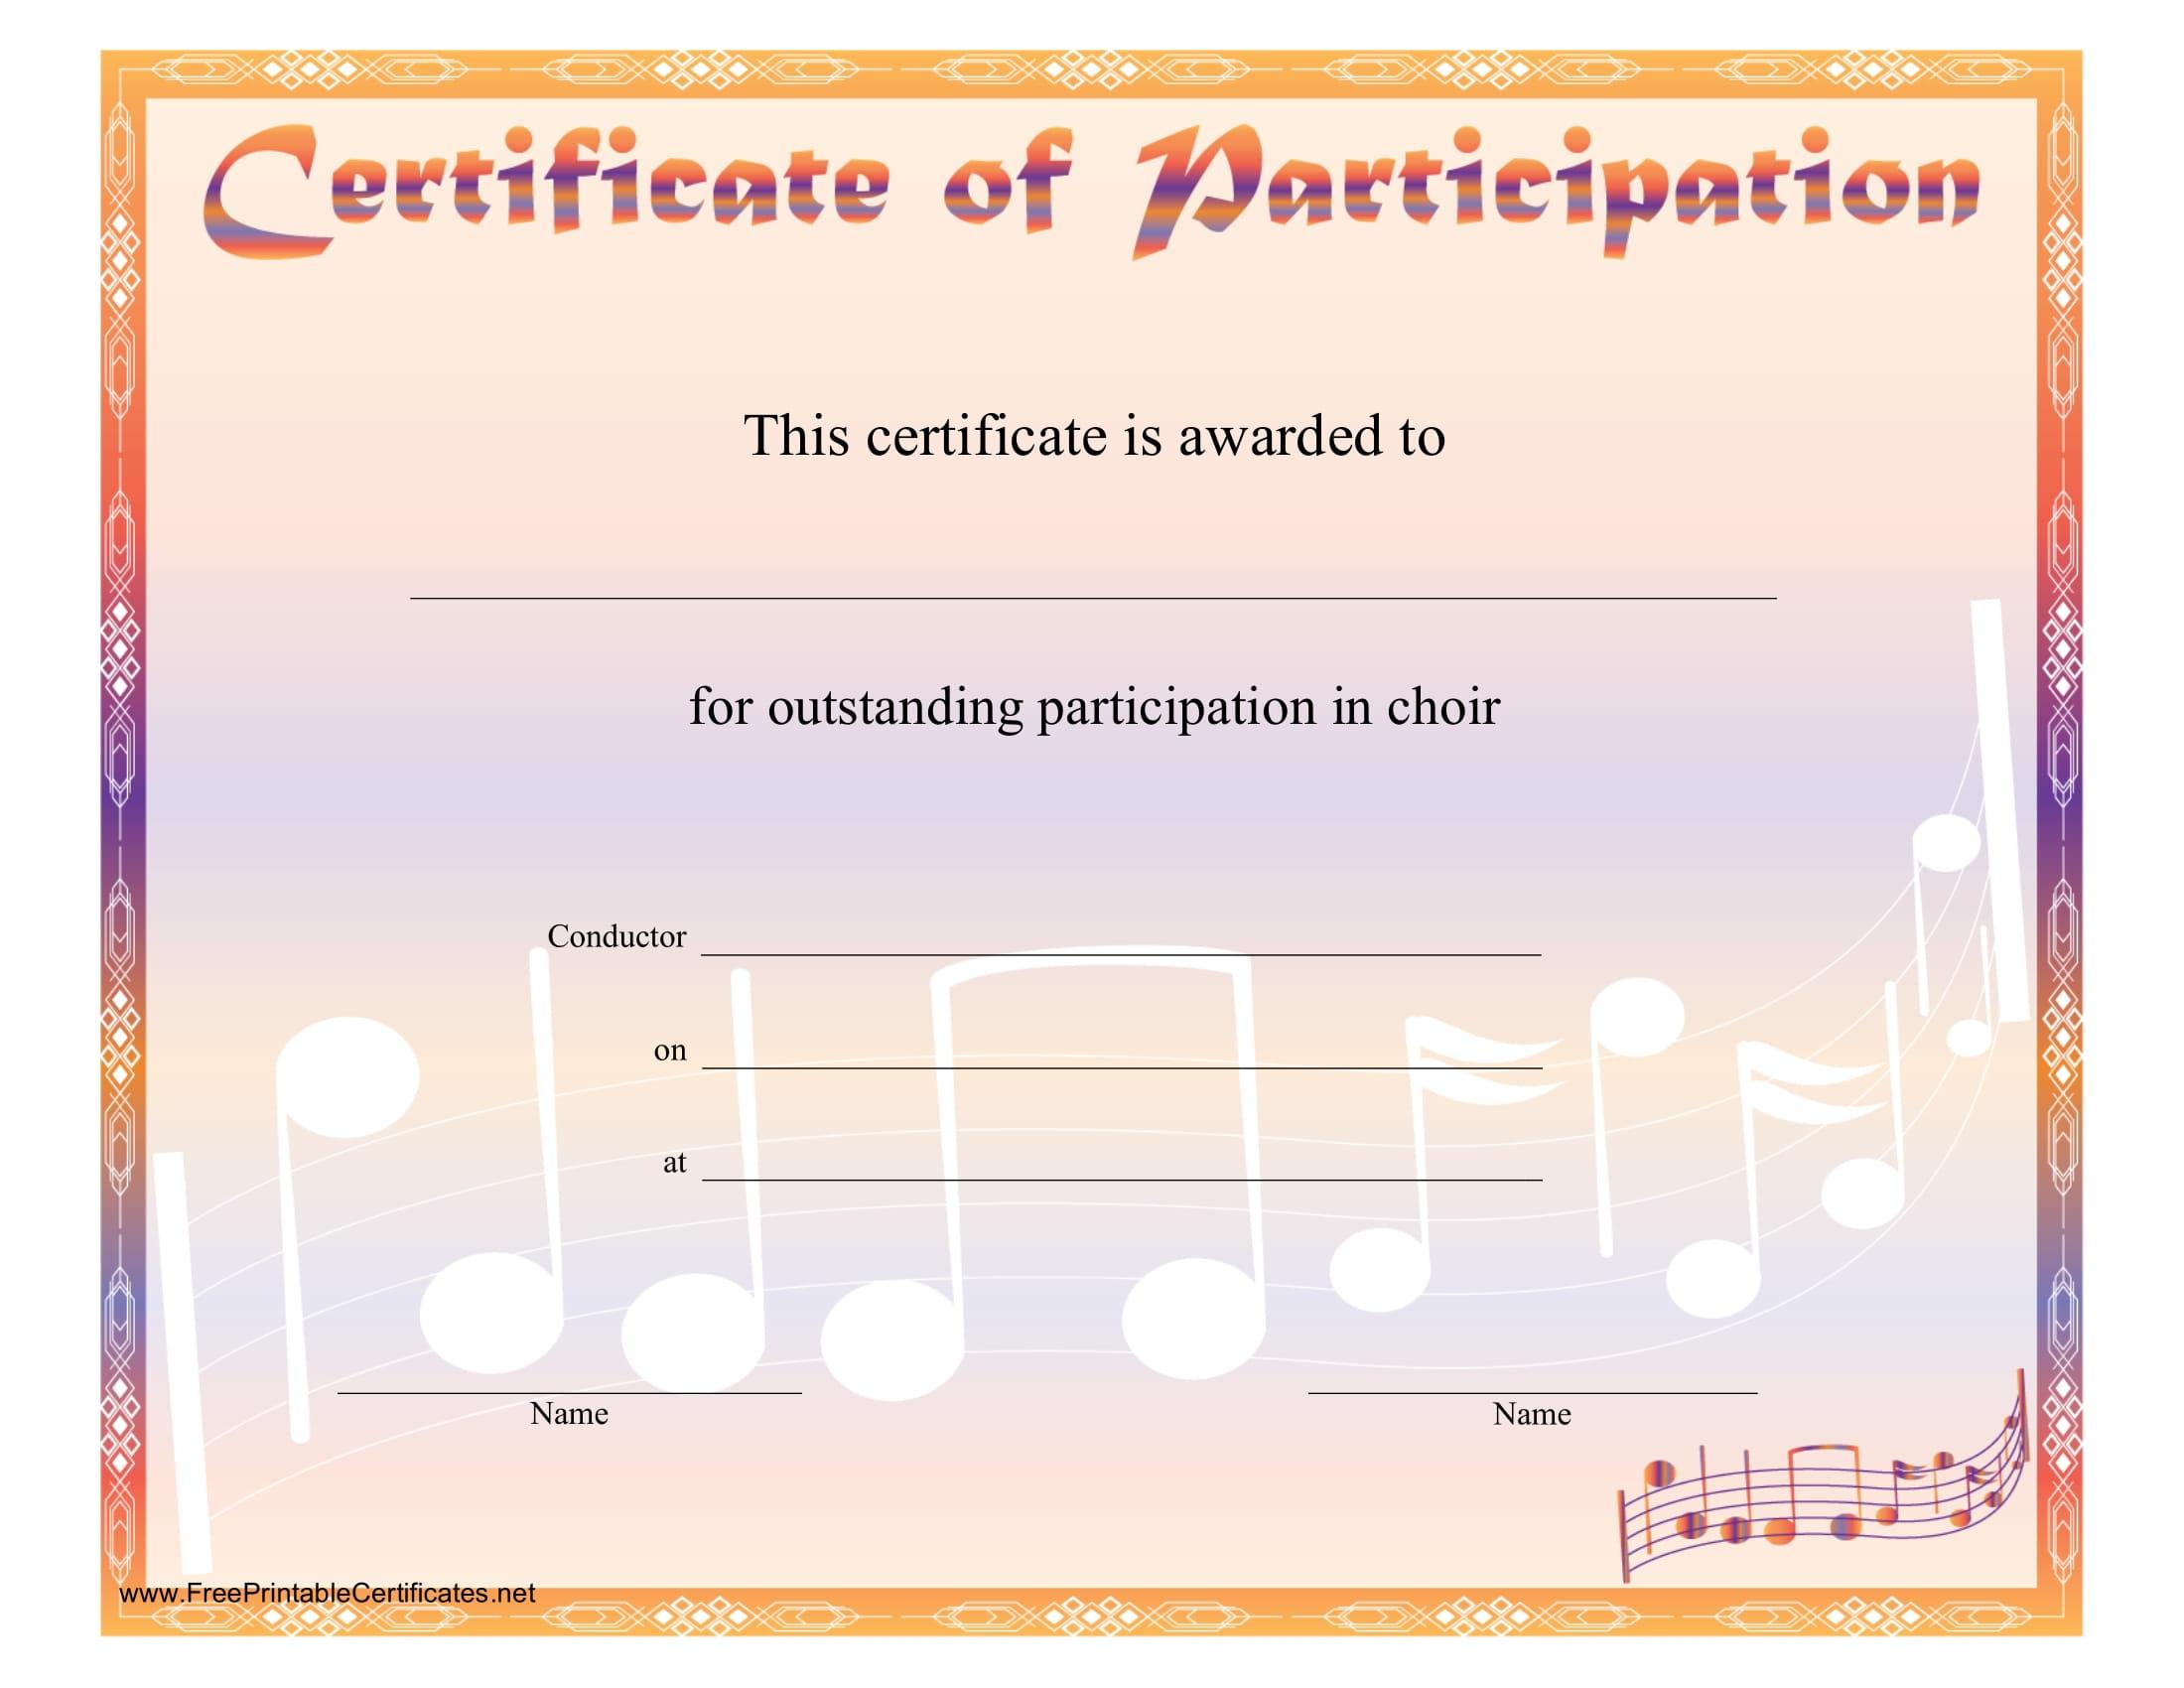 Choir Certificate Template  Professional Template for Amazing Choir Certificate Template